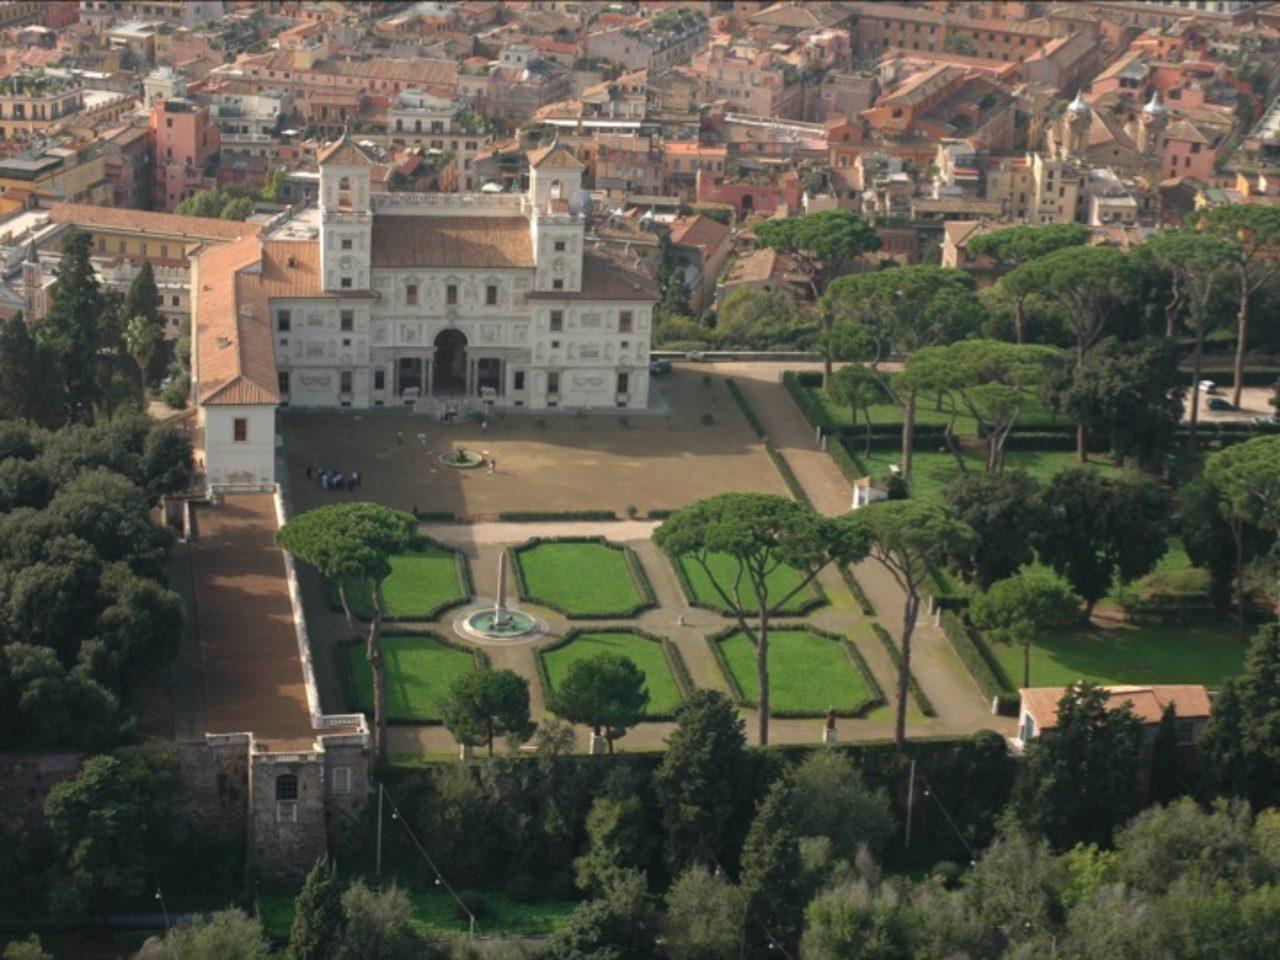 Villa Medici (image source: CeCe Haydock Lecture)